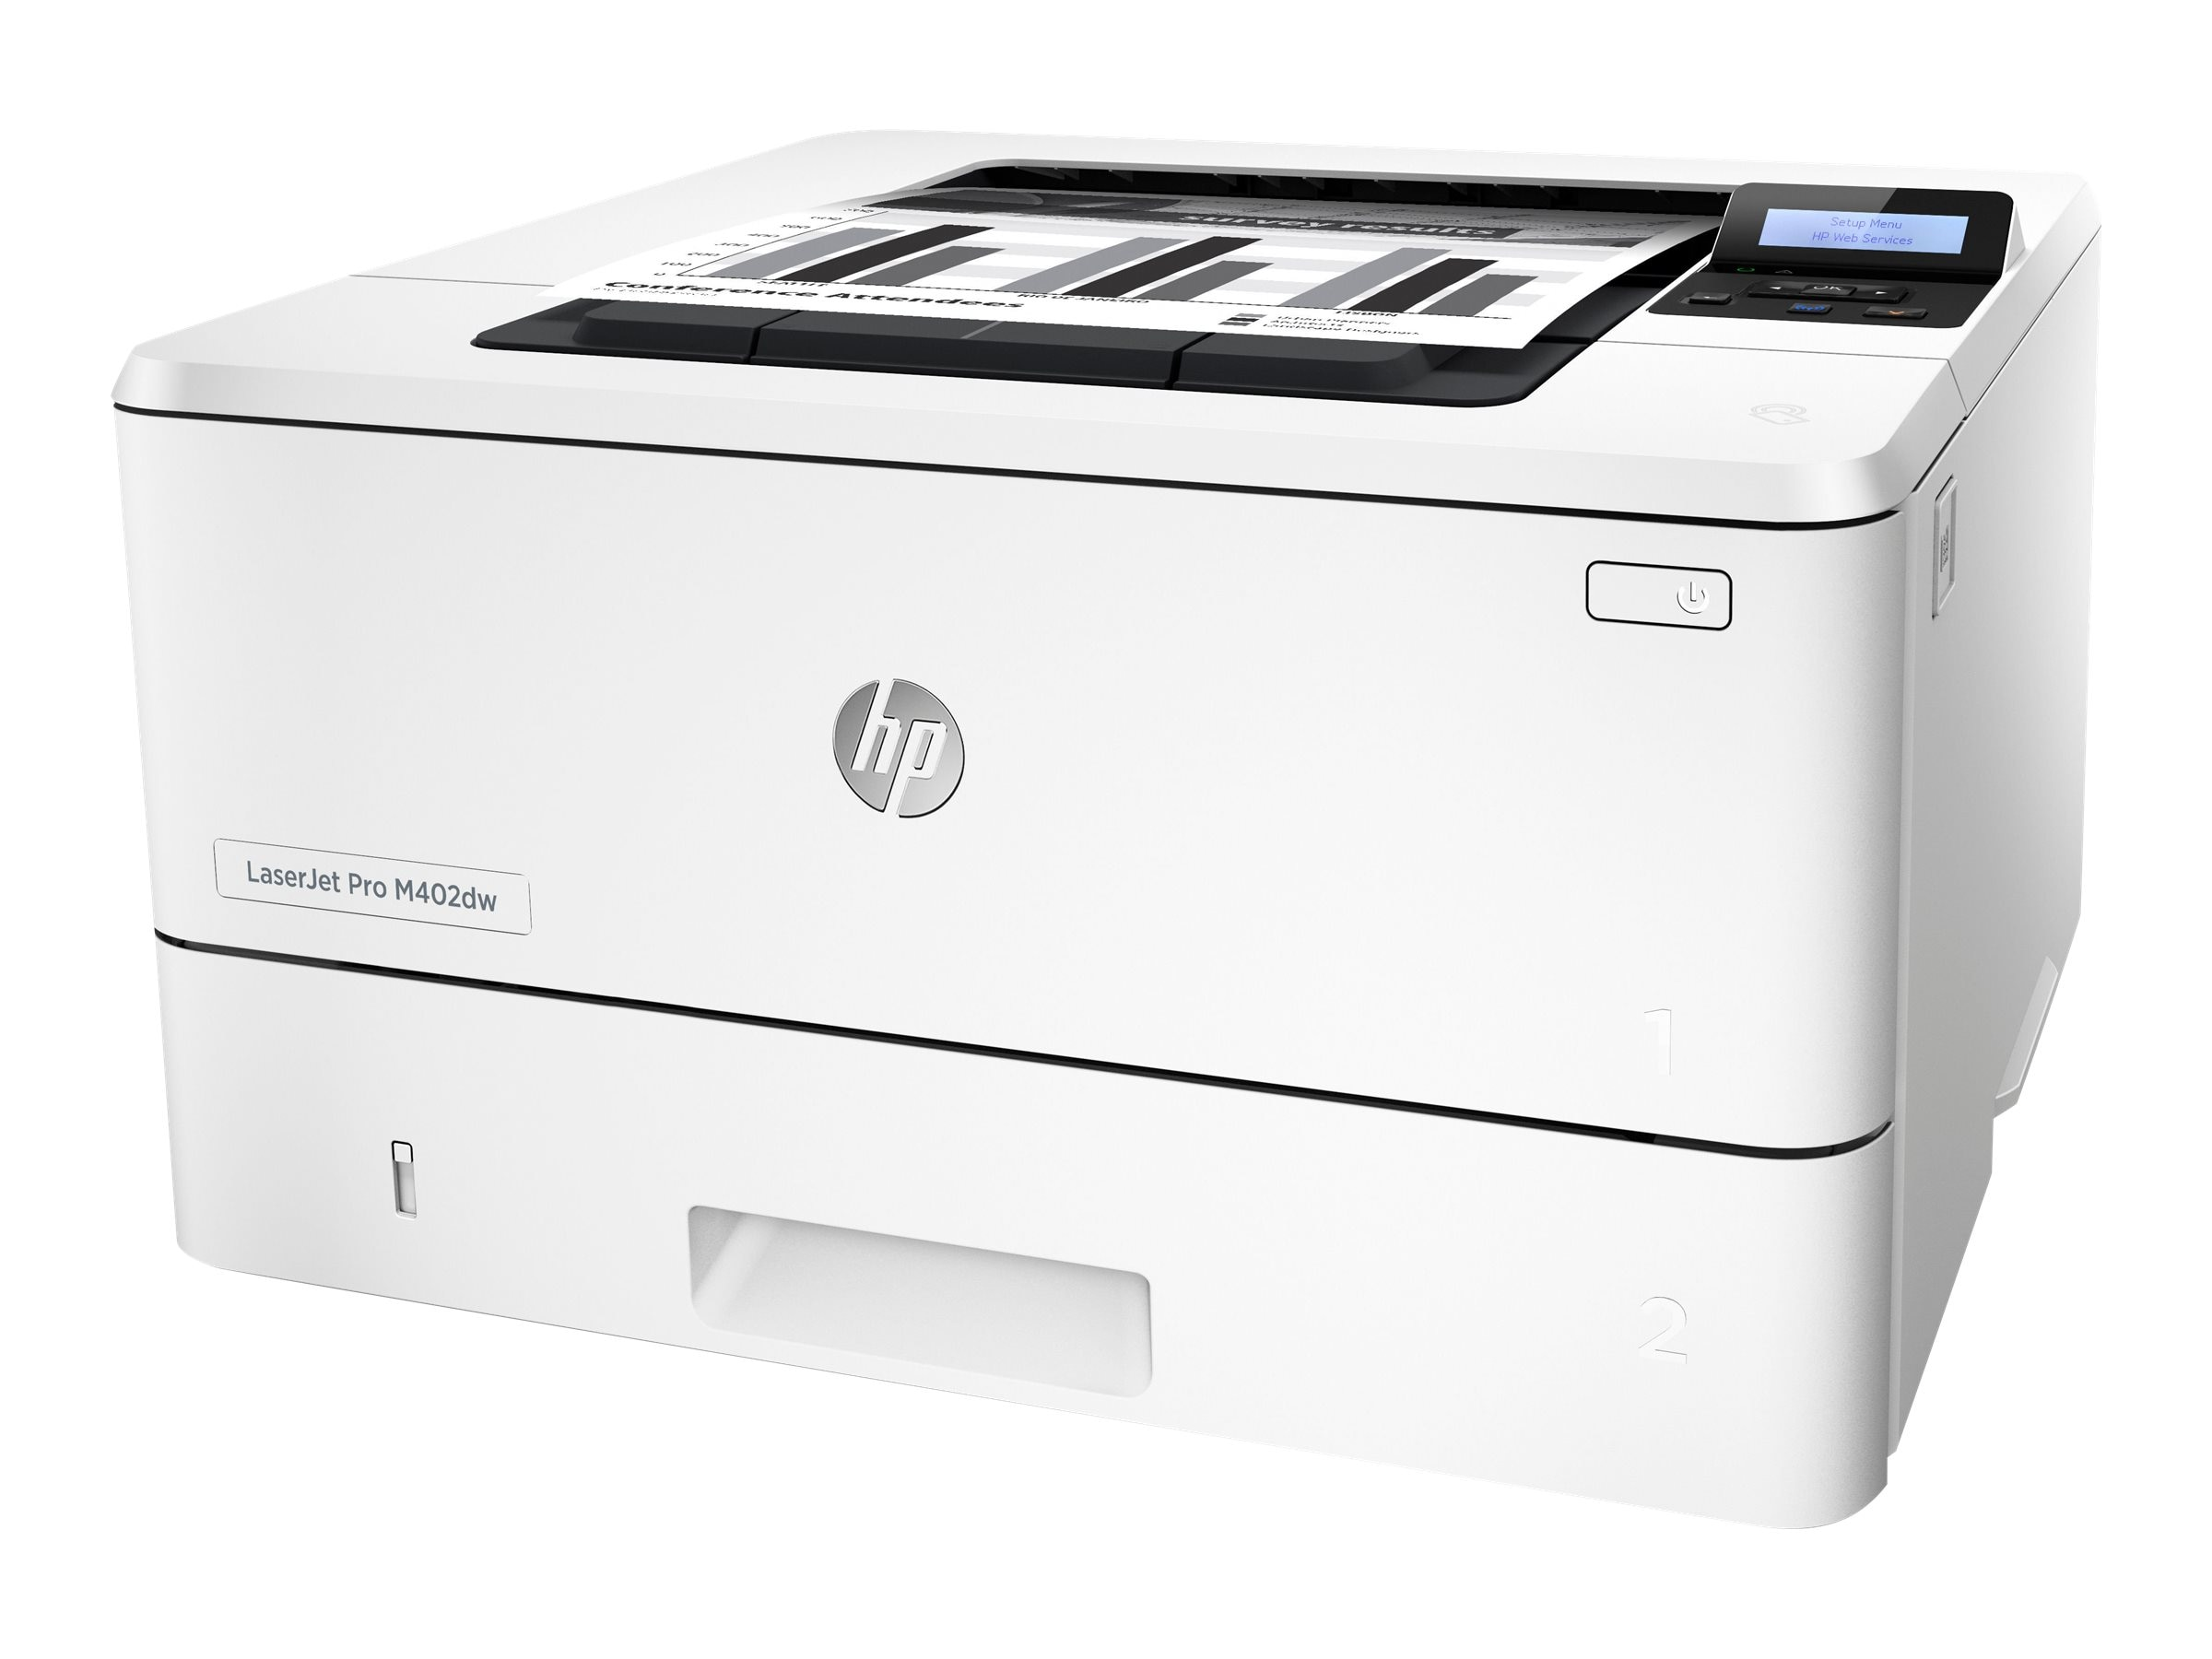 HP LaserJet Pro M402dw Printer ($349.00 - $100.00 Instant Rebate = $249.00. Expires 5 31), C5F95A#BGJ, 30006340, Printers - Laser & LED (monochrome)